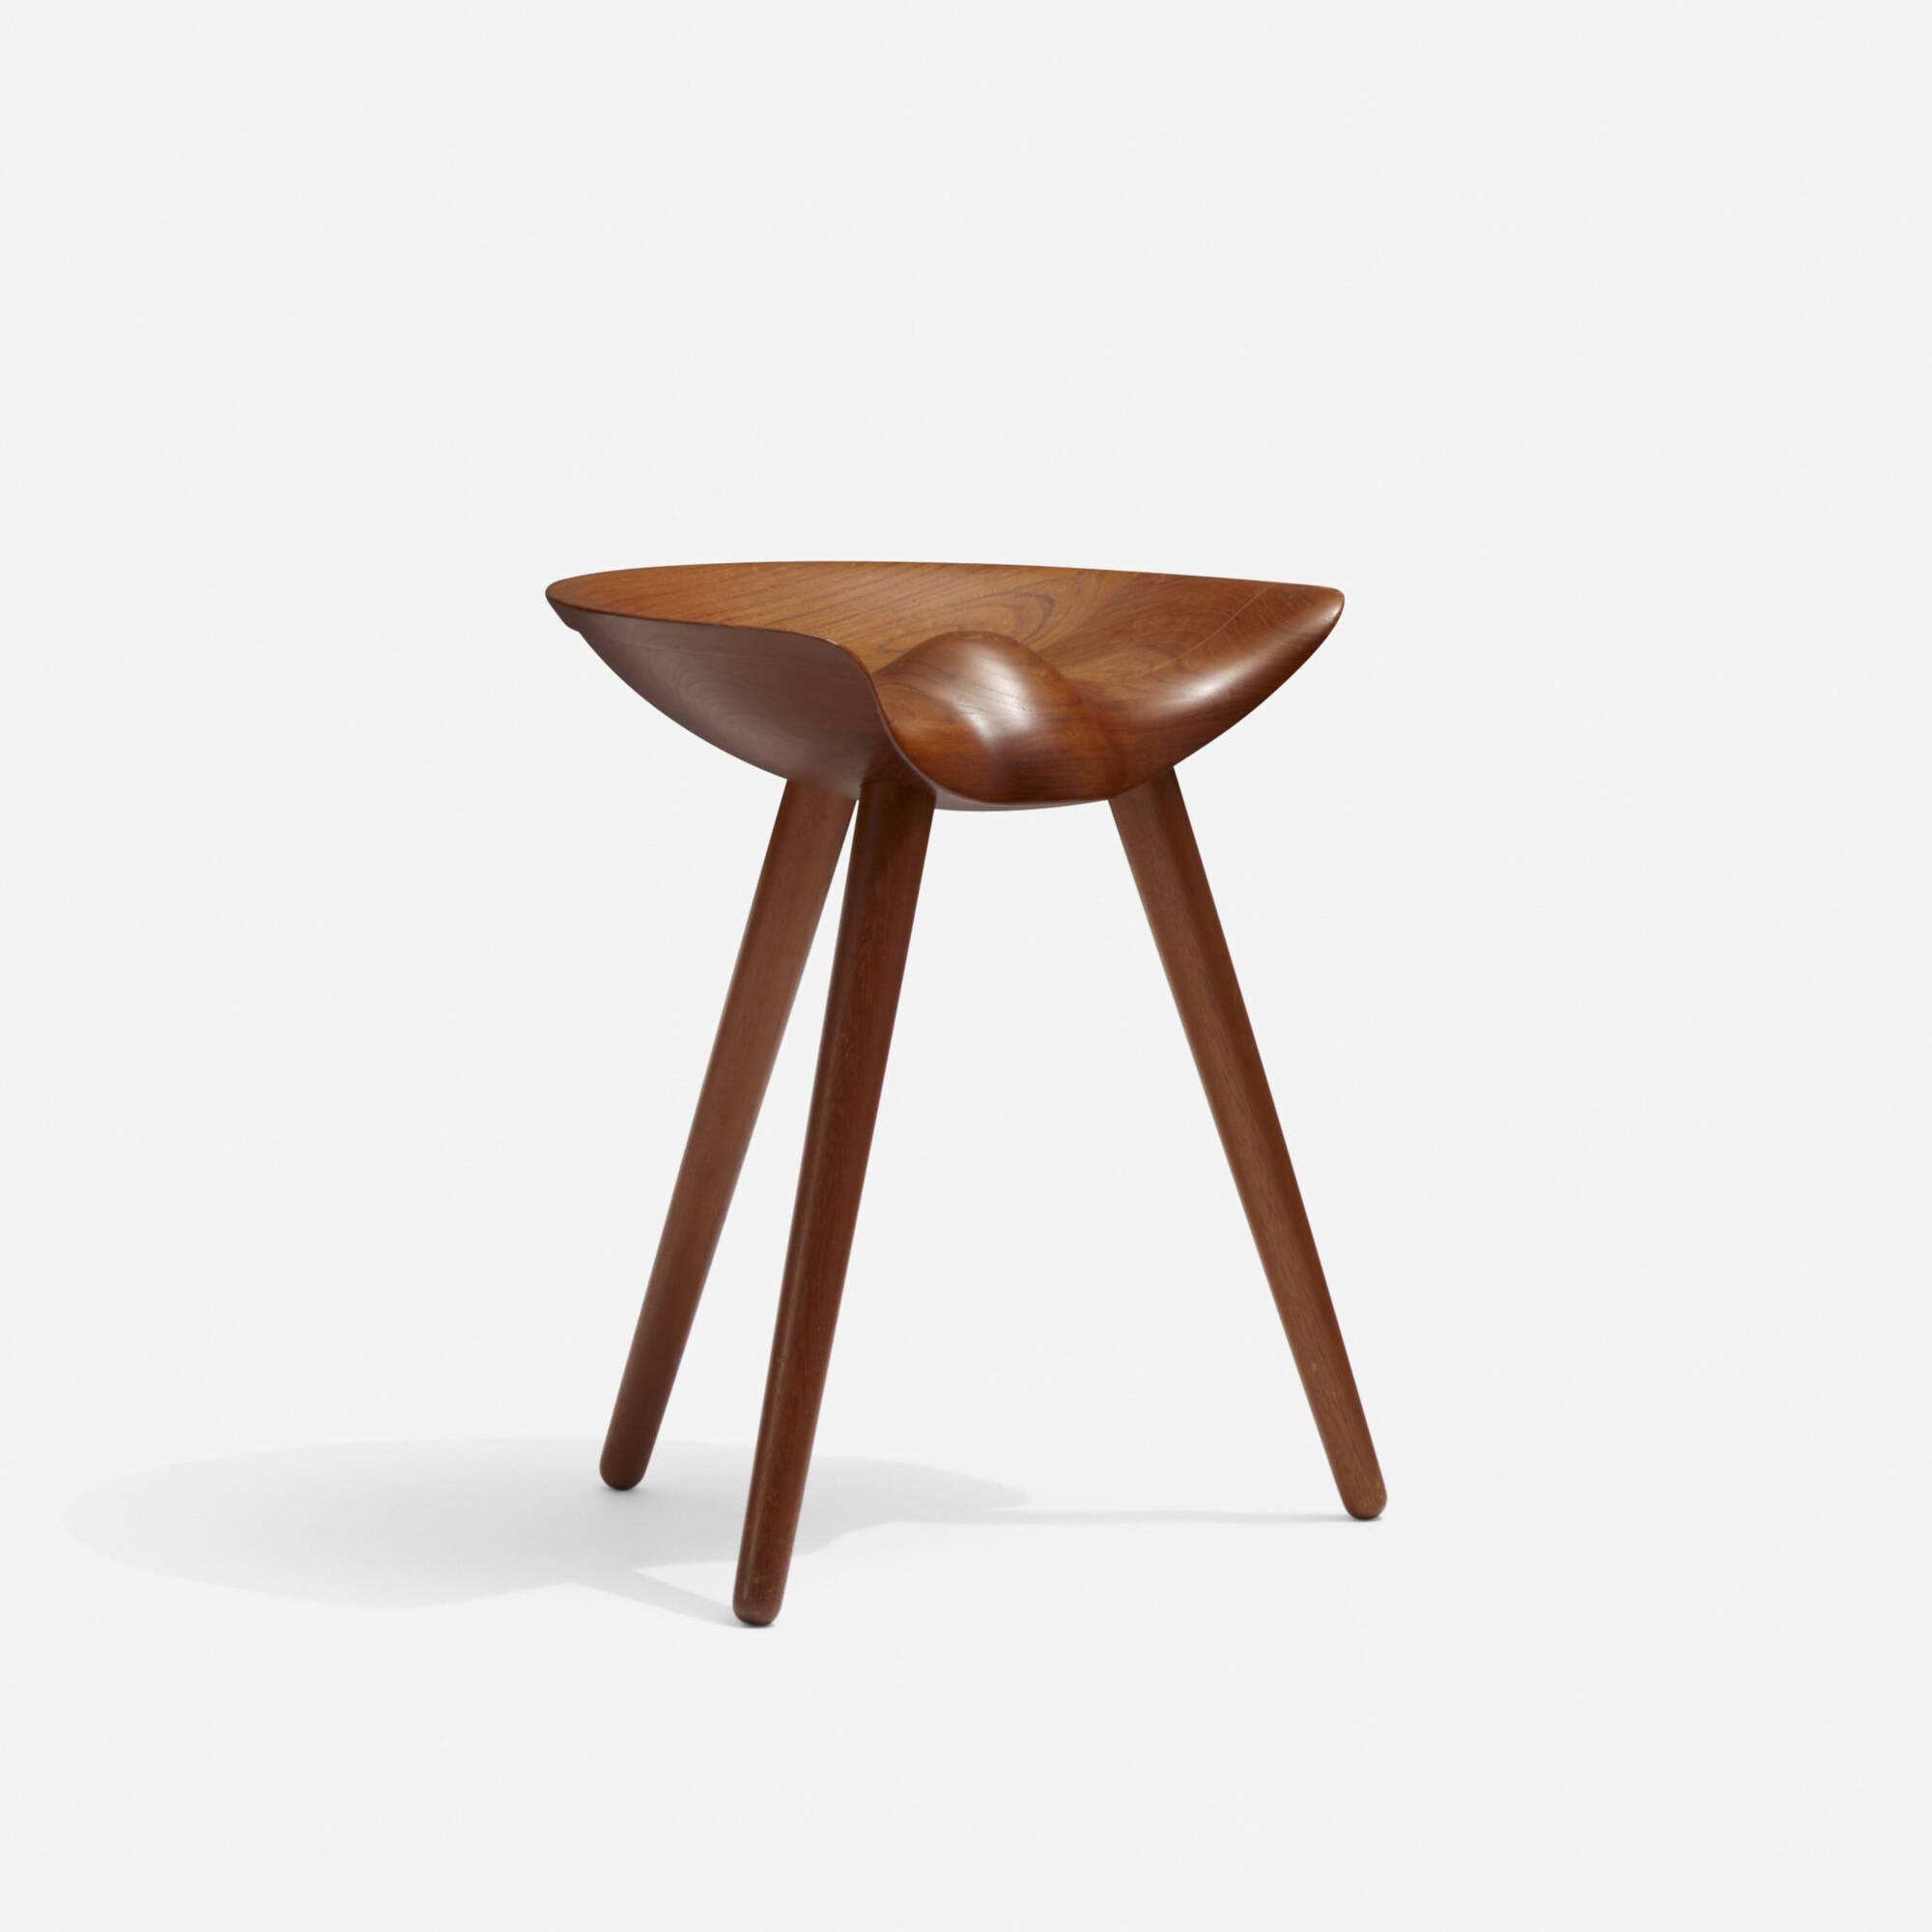 304: Mogens Lassen / stool (1 of 2)